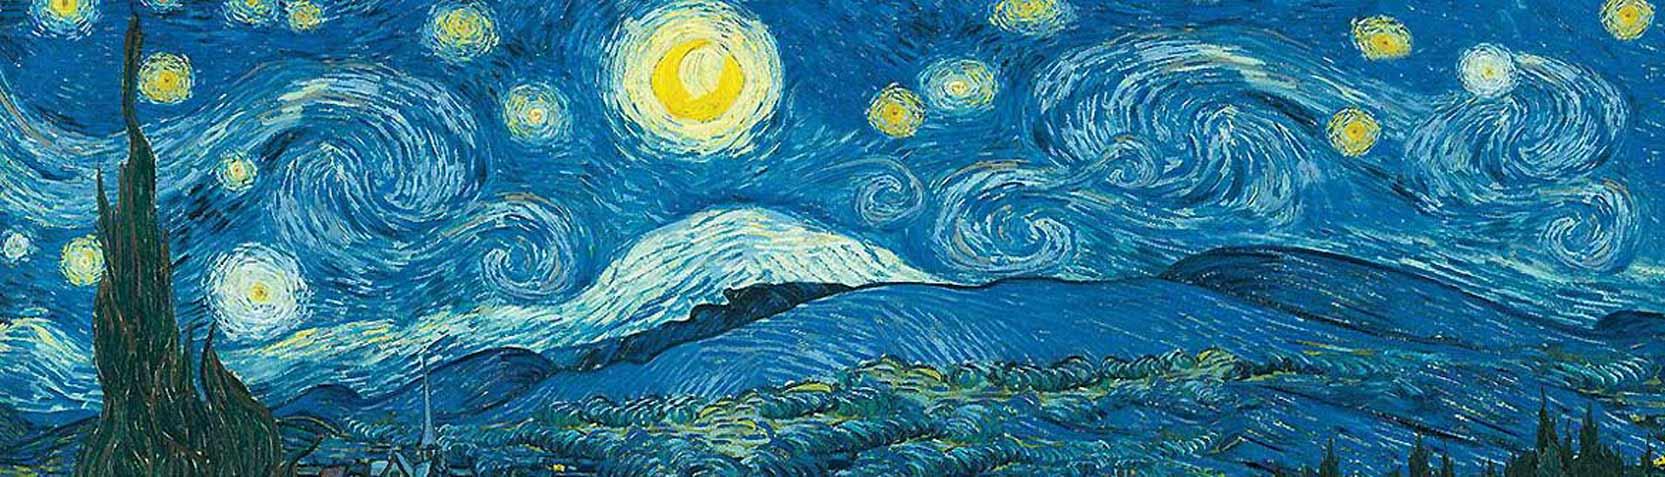 Artistas - Vincent van Gogh